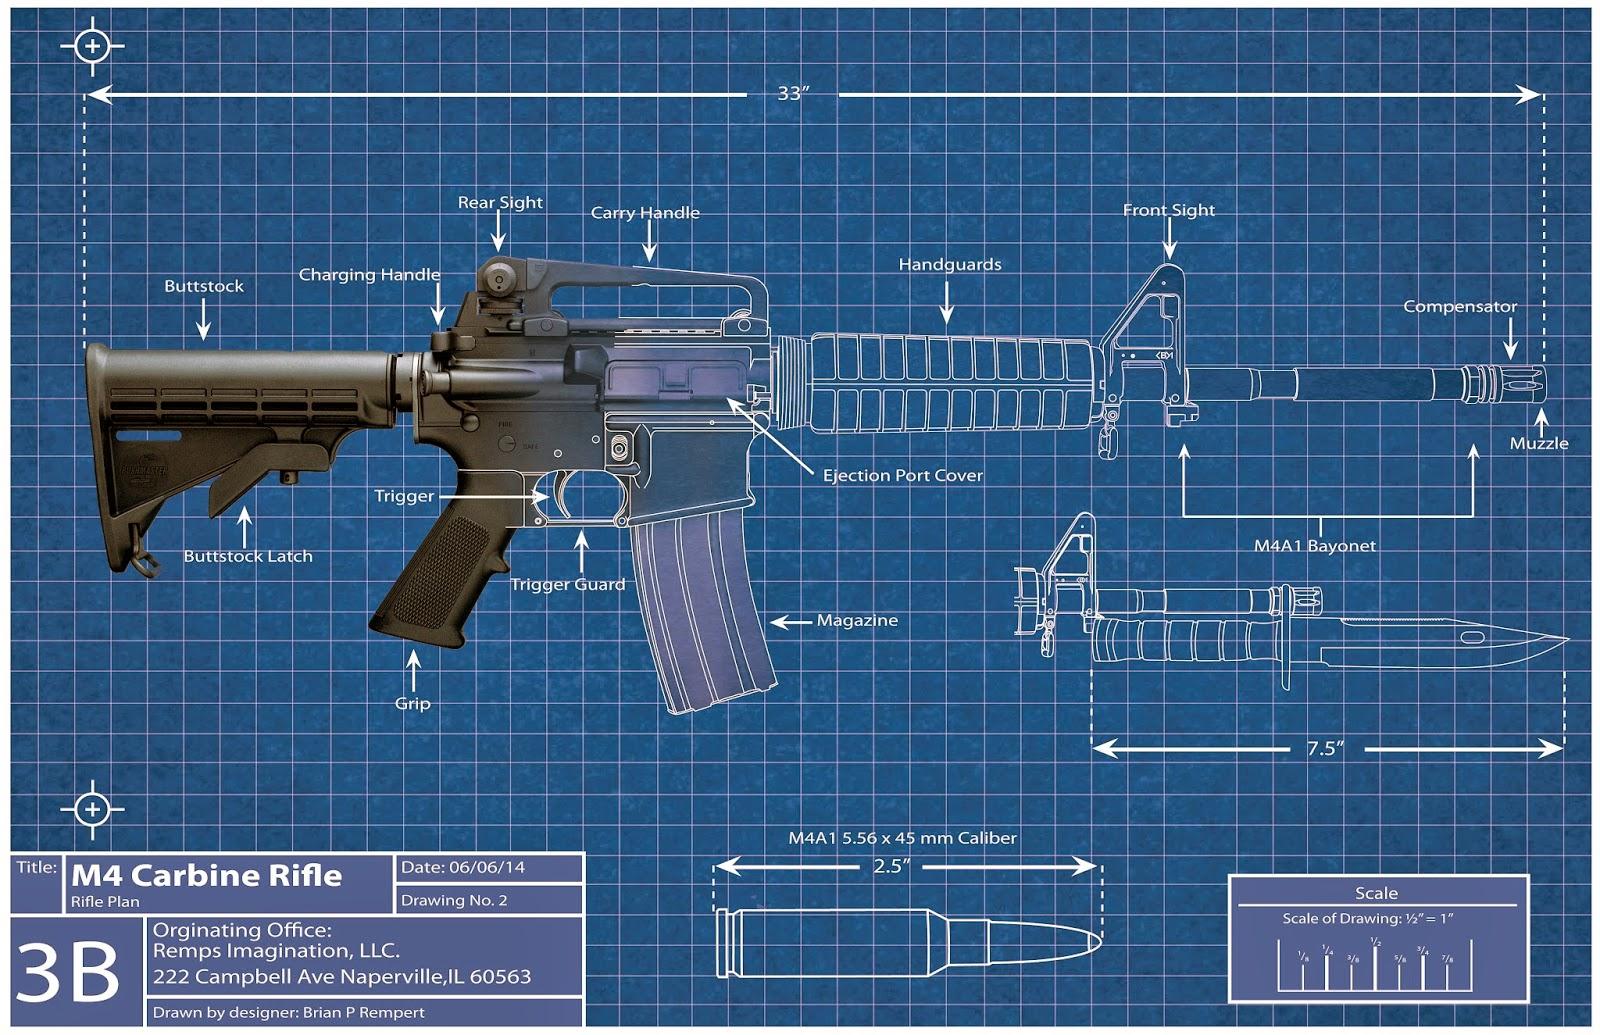 Artwork by remps imagination m4 carbine blueprint for How to make a blueprint online